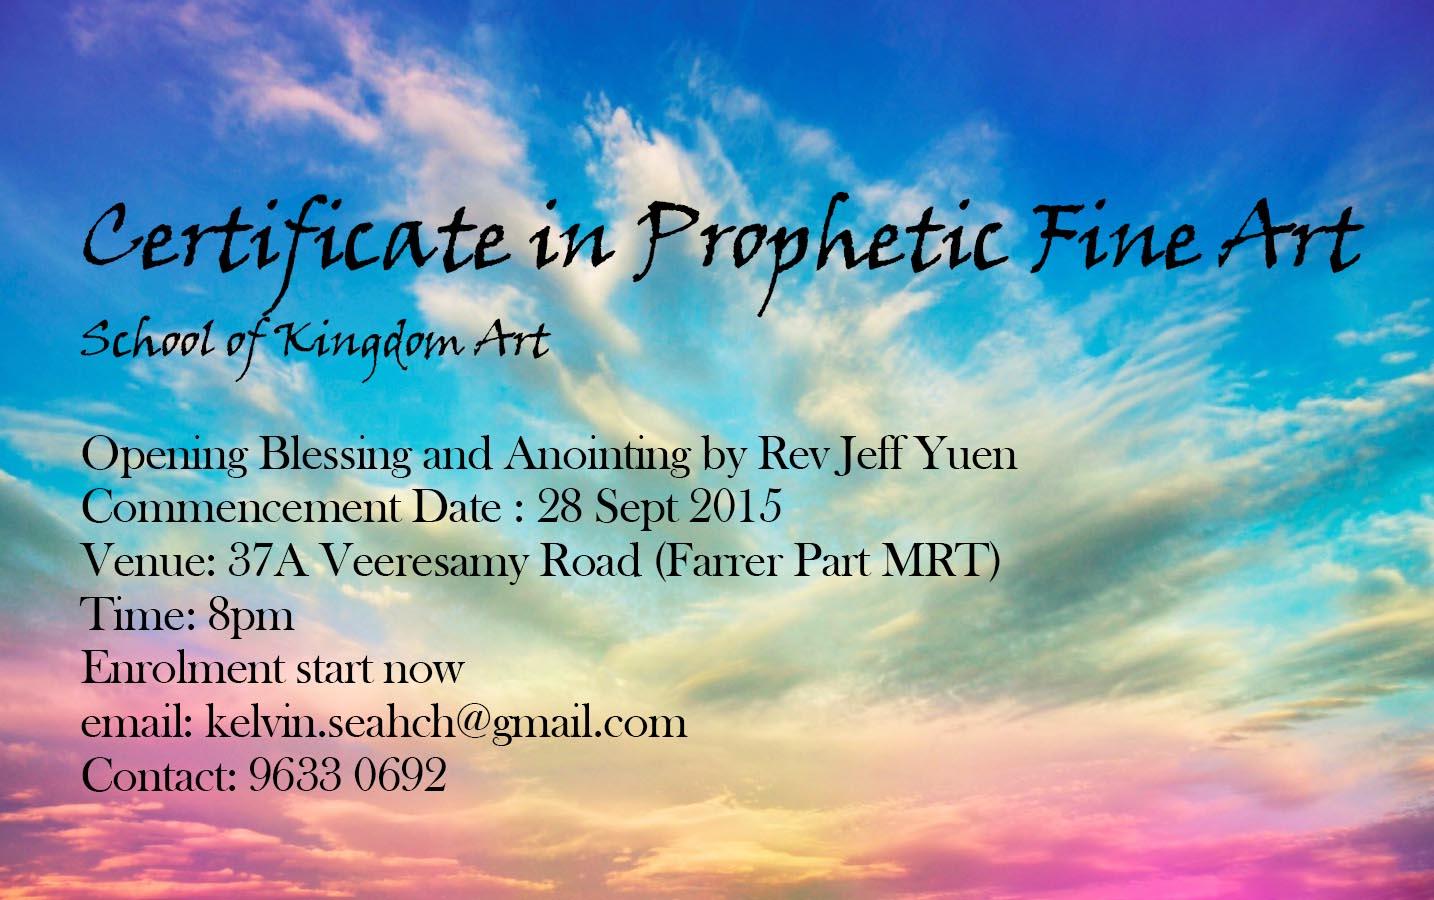 Certificate in Prophetic Fine Arts Course – Soakability